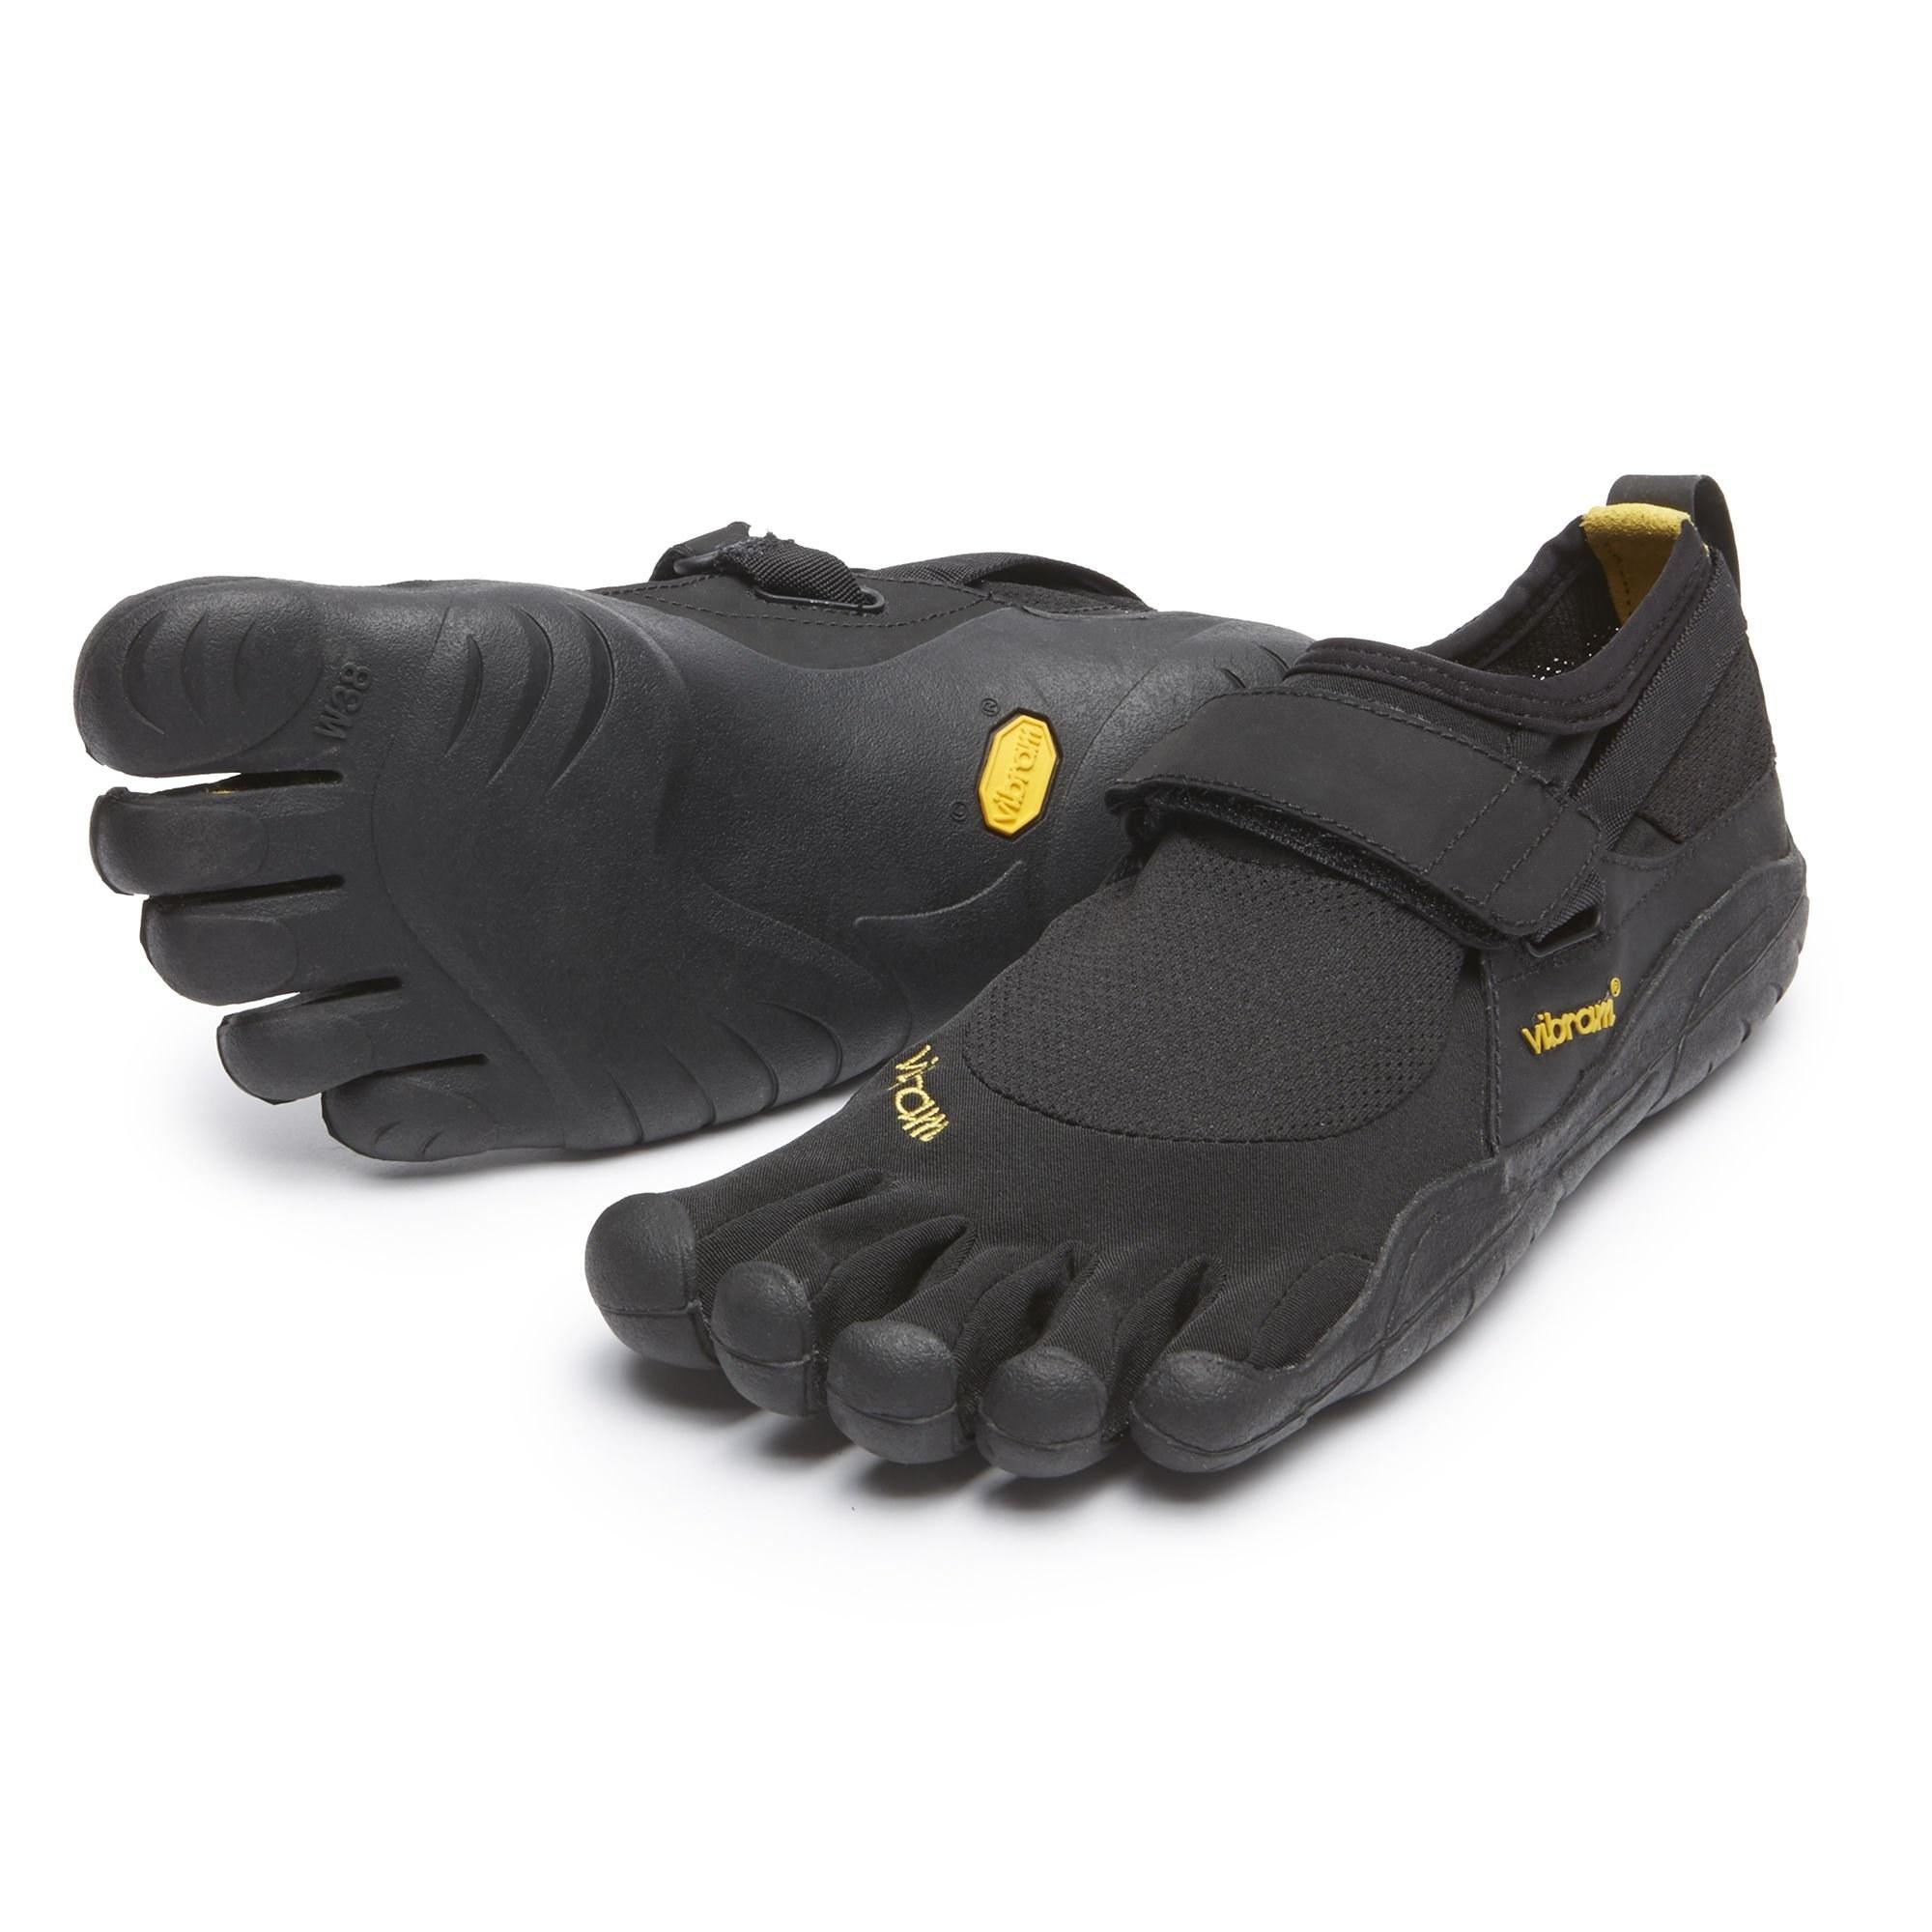 Vibram FiveFingers Women's KSO Shoes & Toesocks Bundle